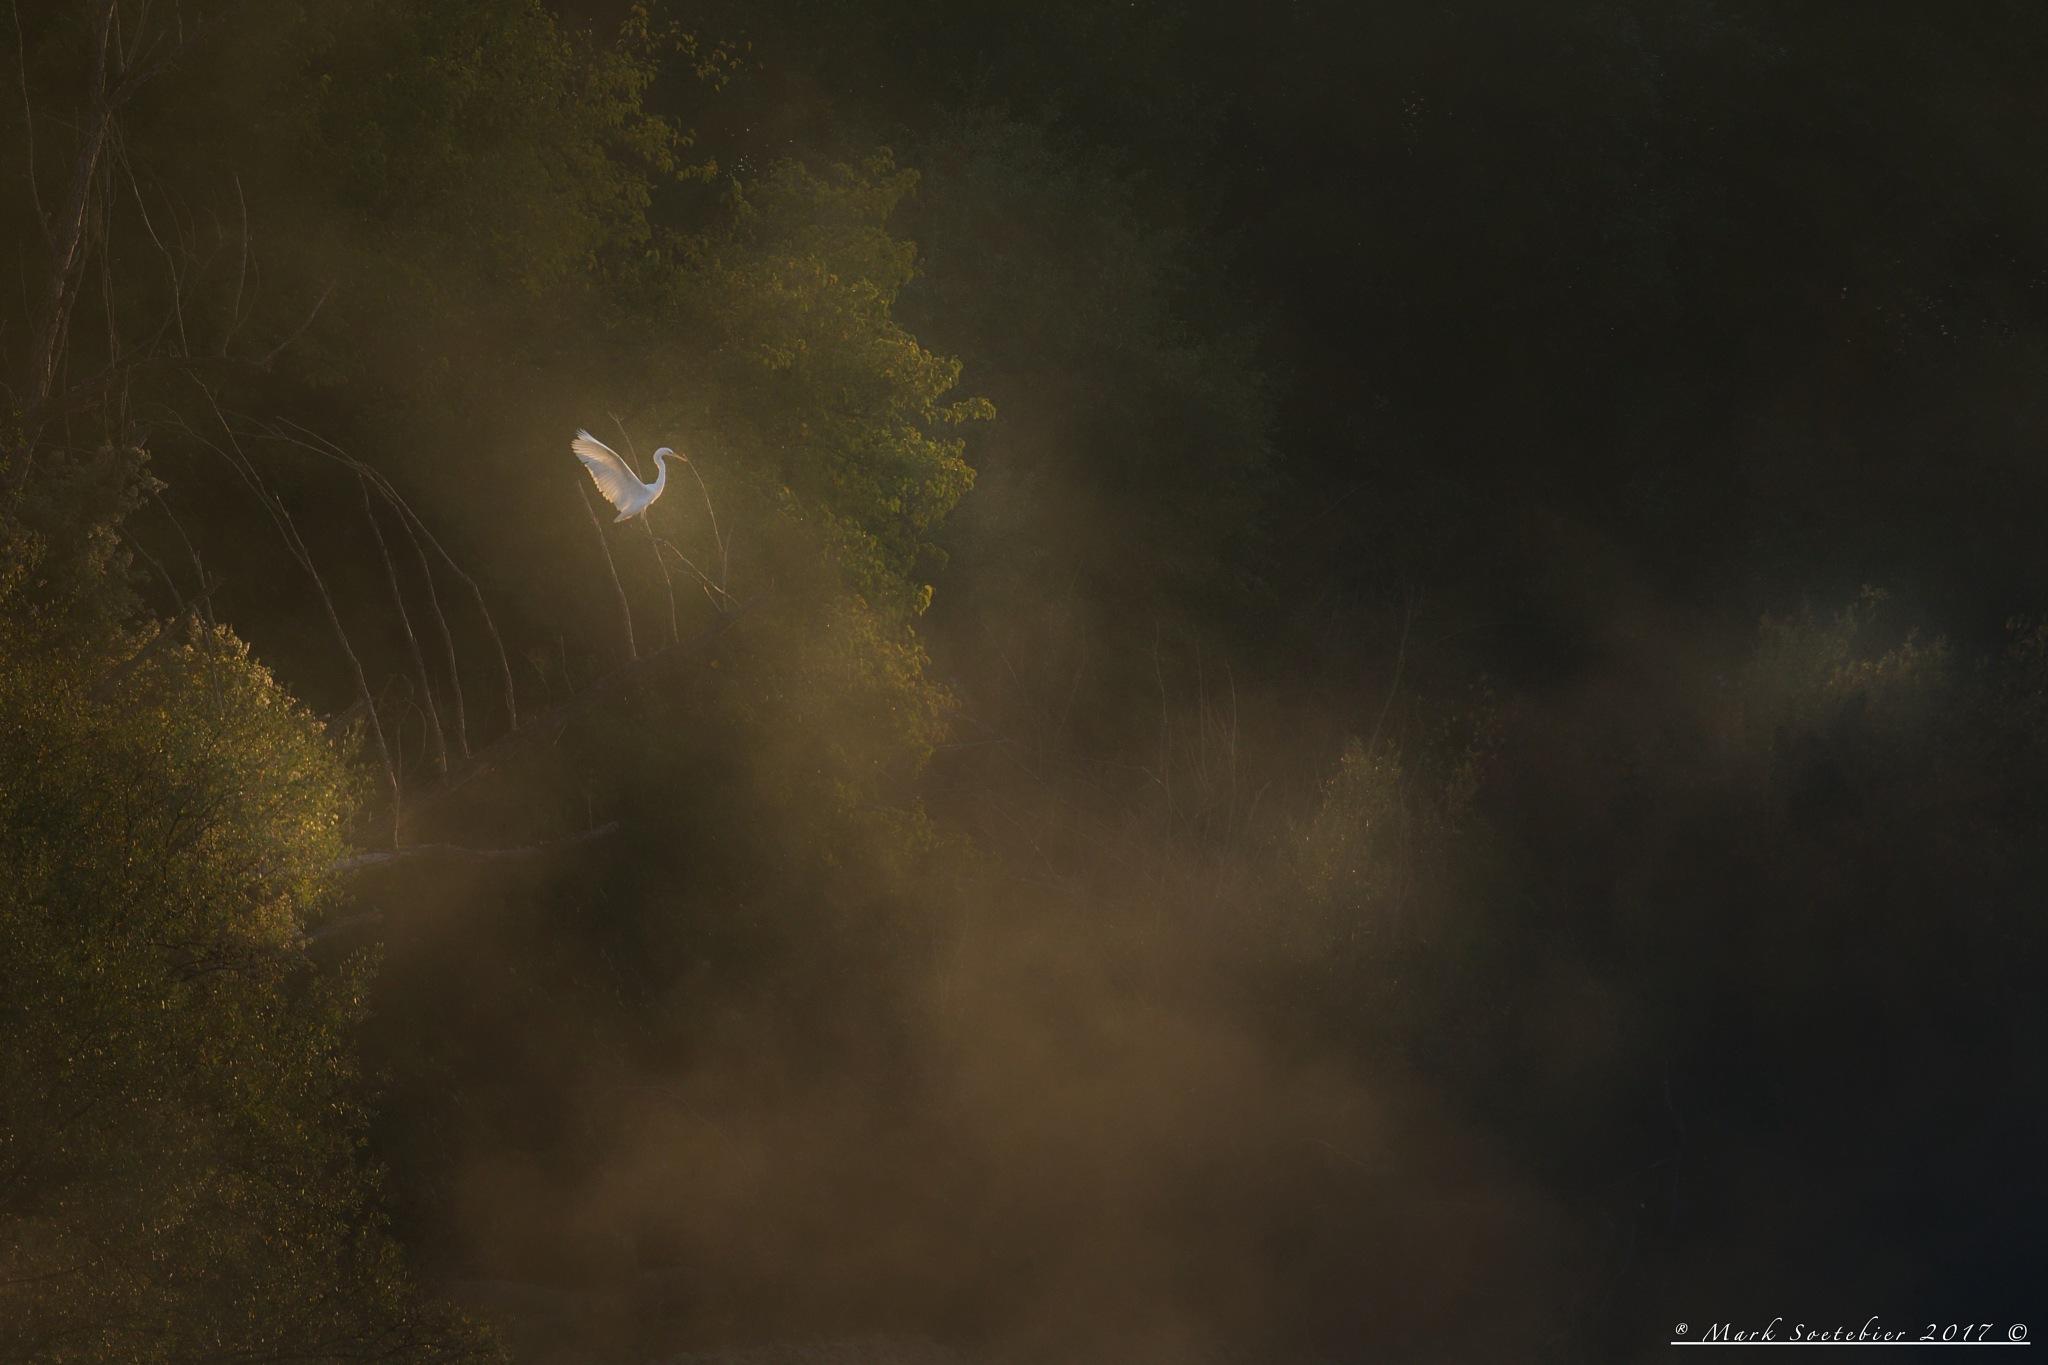 Great White Heron in the Mist by MarkSoetebierVideophotography